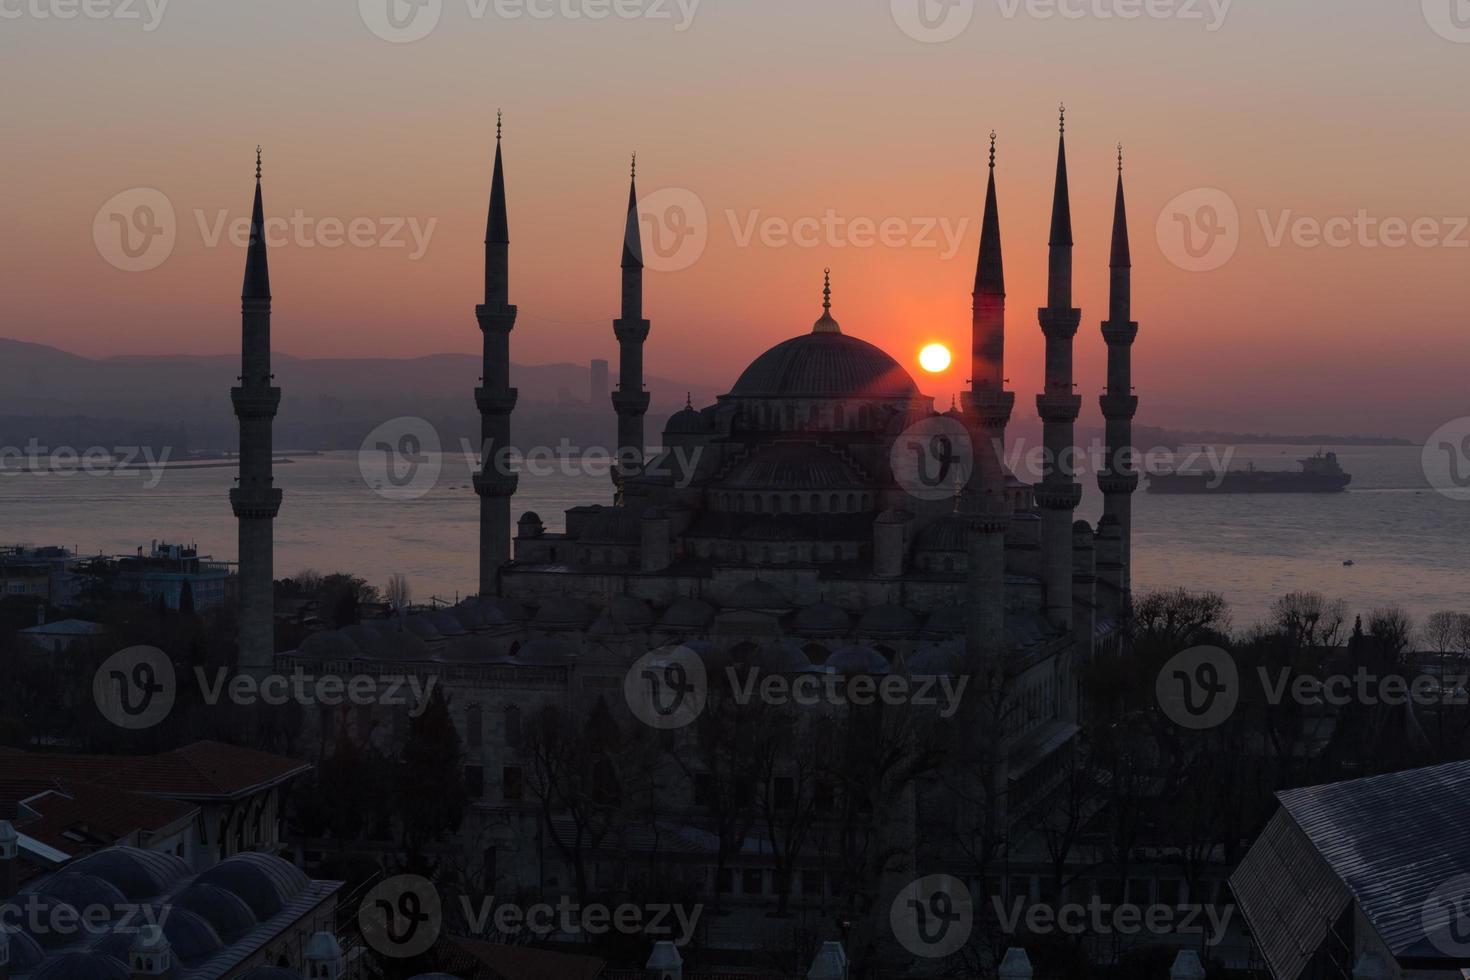 sultan ahmet camii - moschea blu a istanbul, turchia. foto